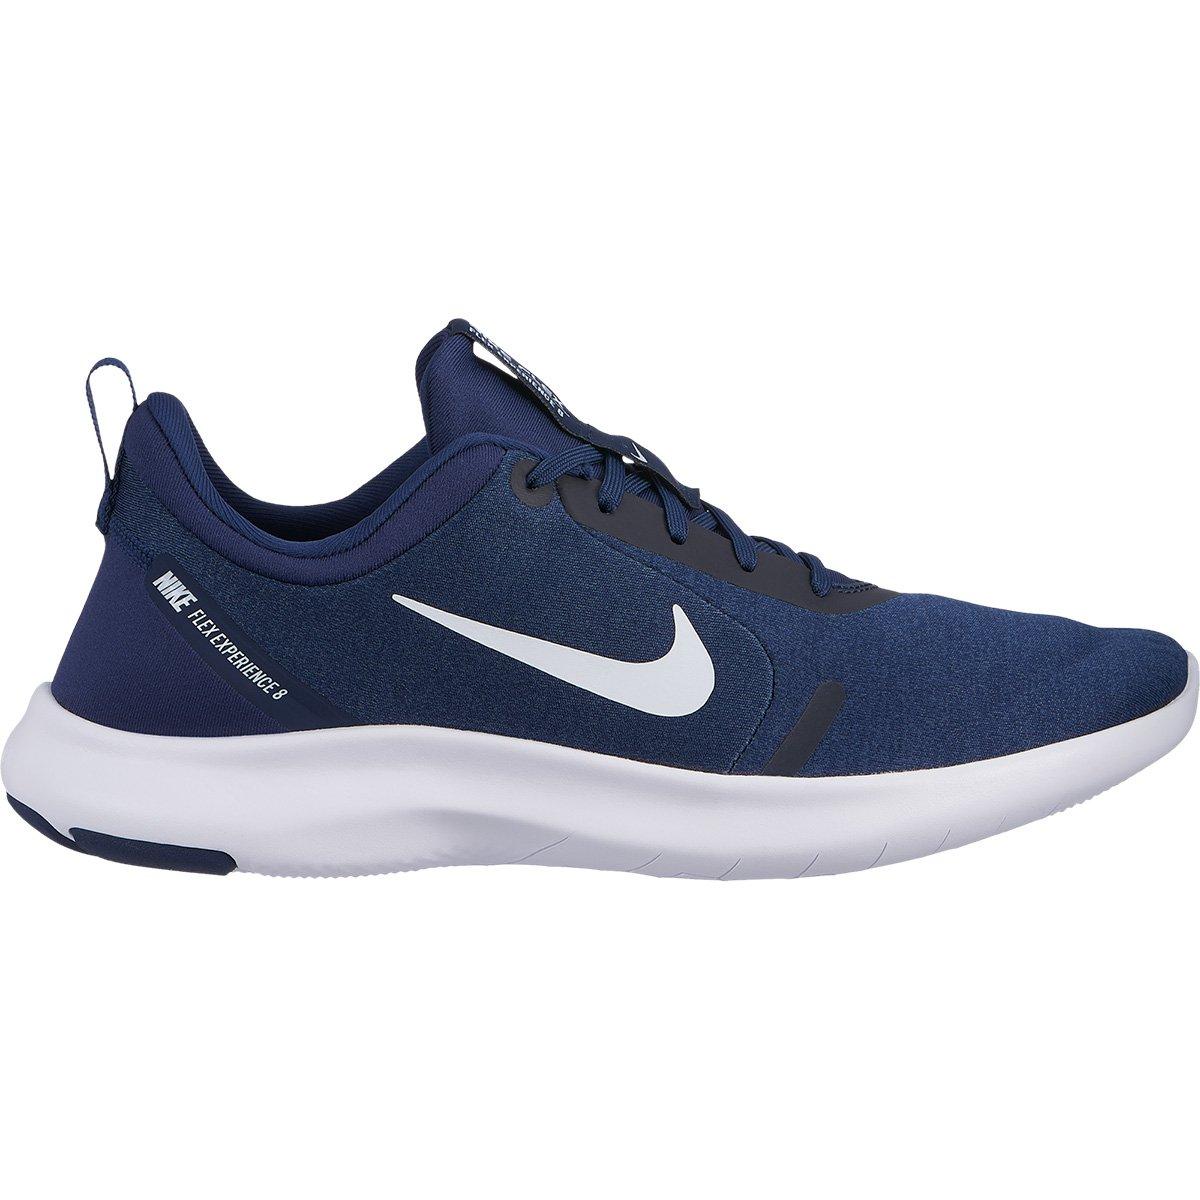 93b81134e01 Tênis Nike Flex Experience Rn 8 Masculino - Compre Agora